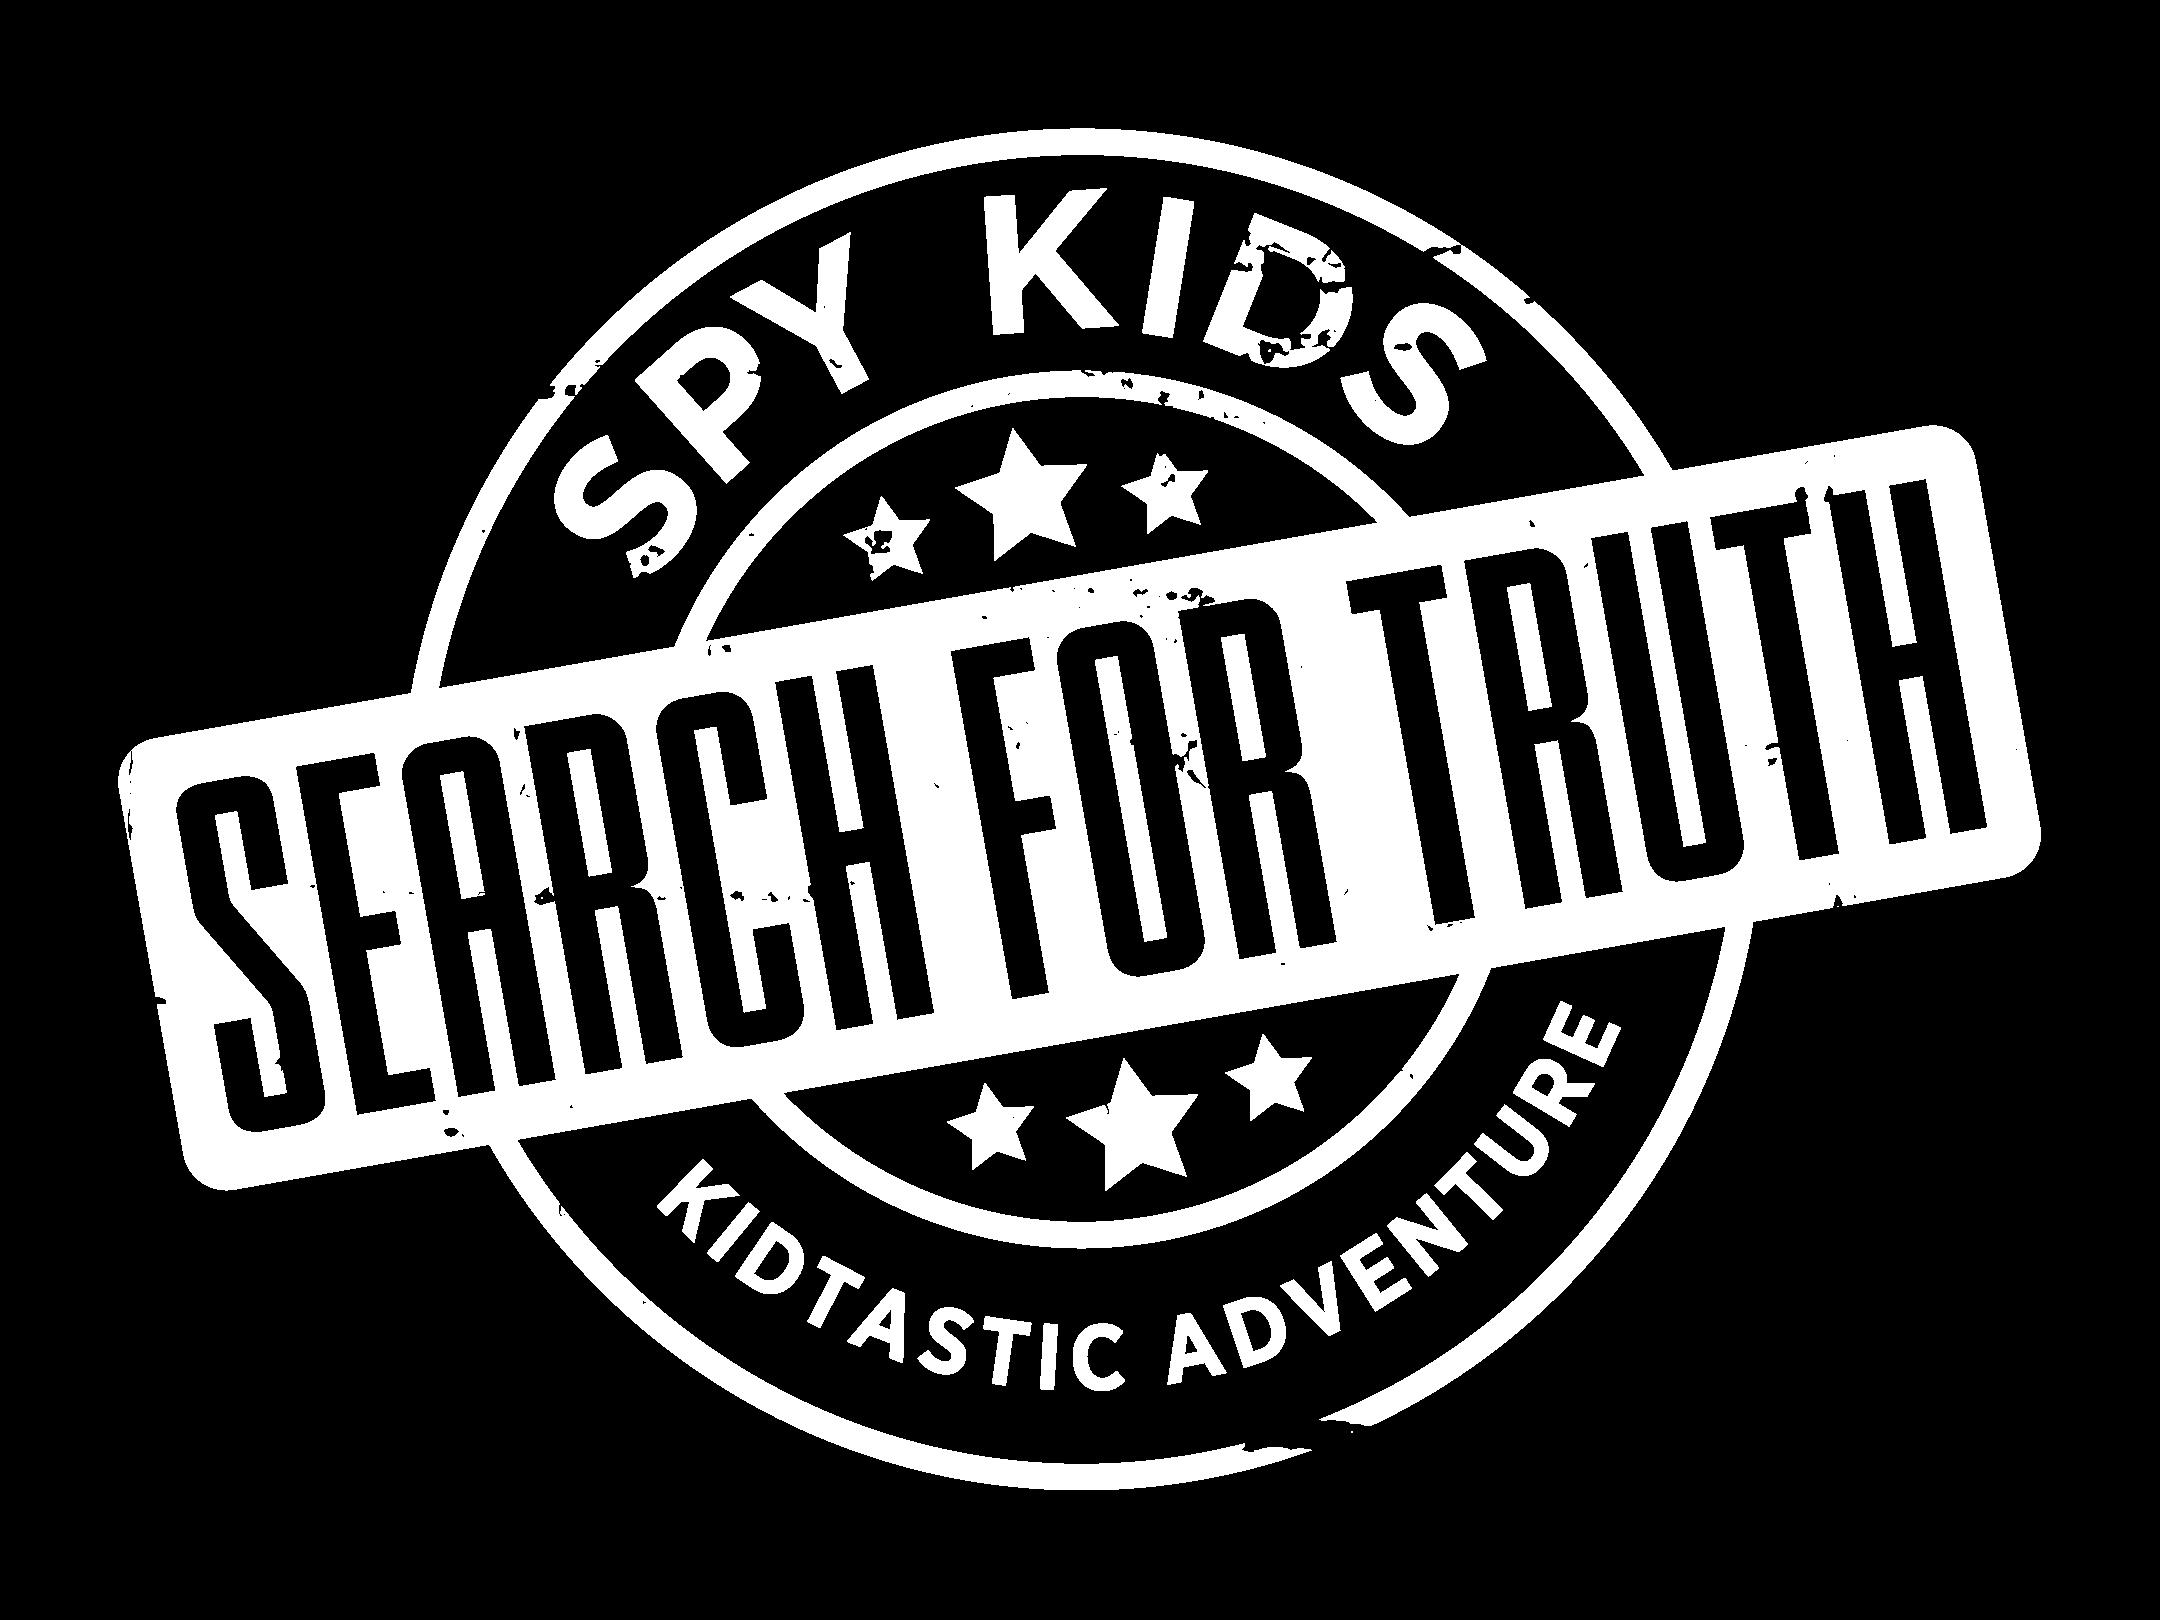 SpyKids_LogoWhite